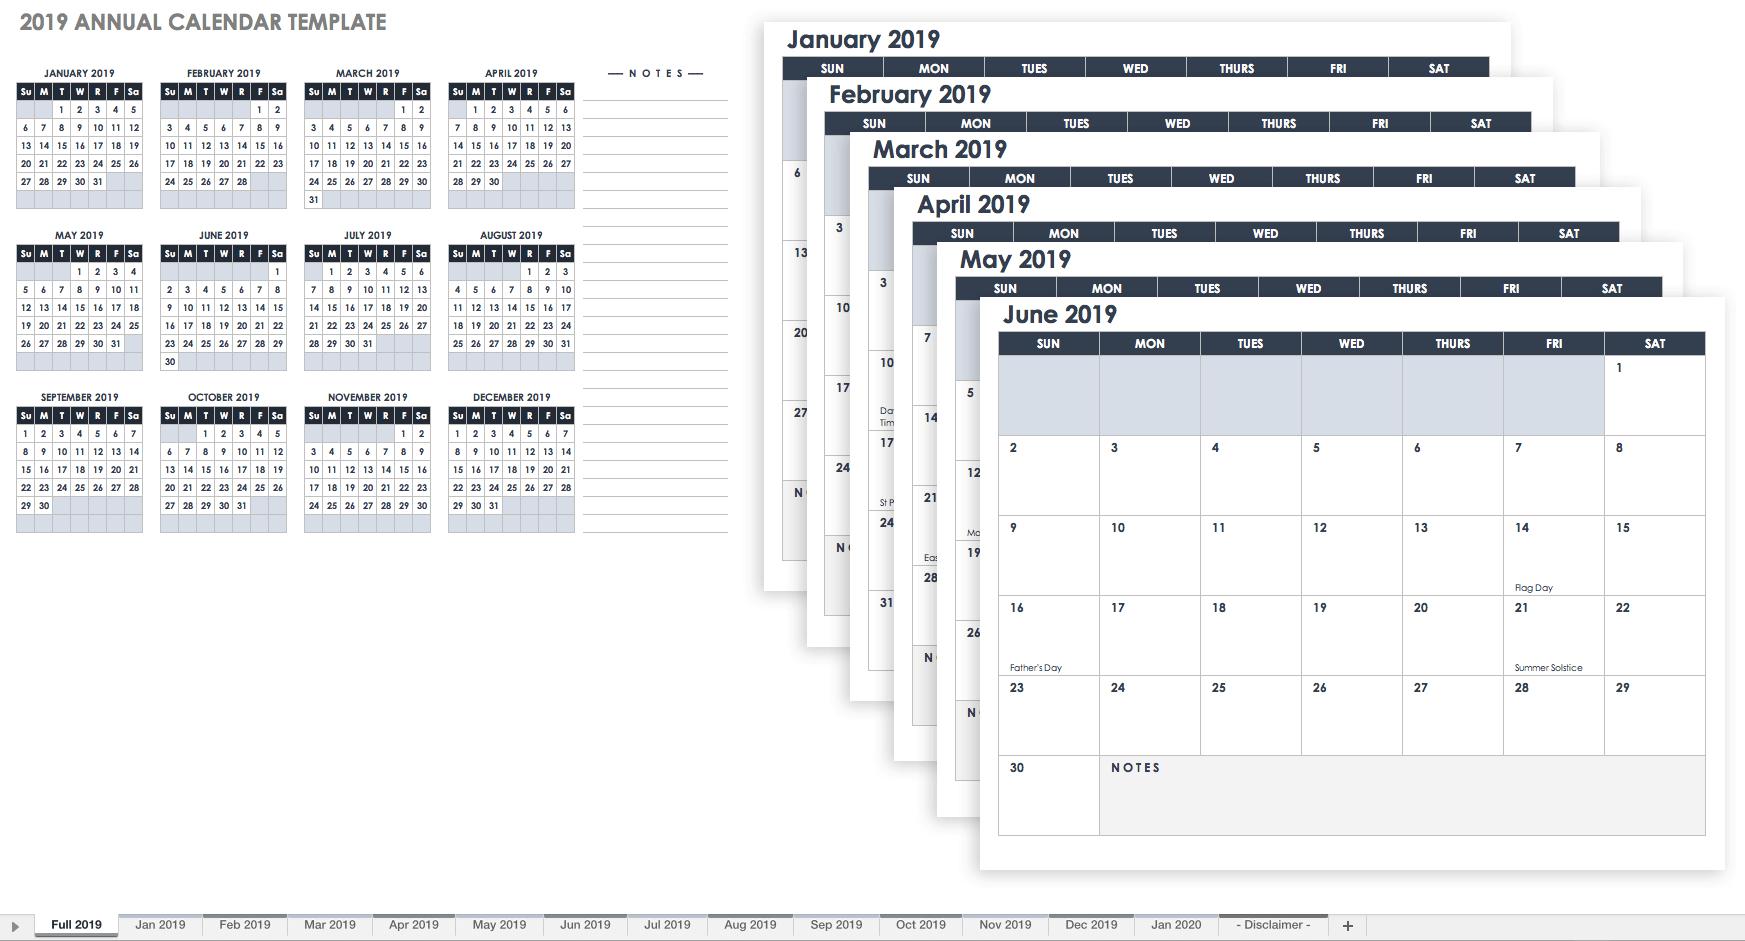 15 Free Monthly Calendar Templates | Smartsheet with regard to Excel Monthly Calendar Template